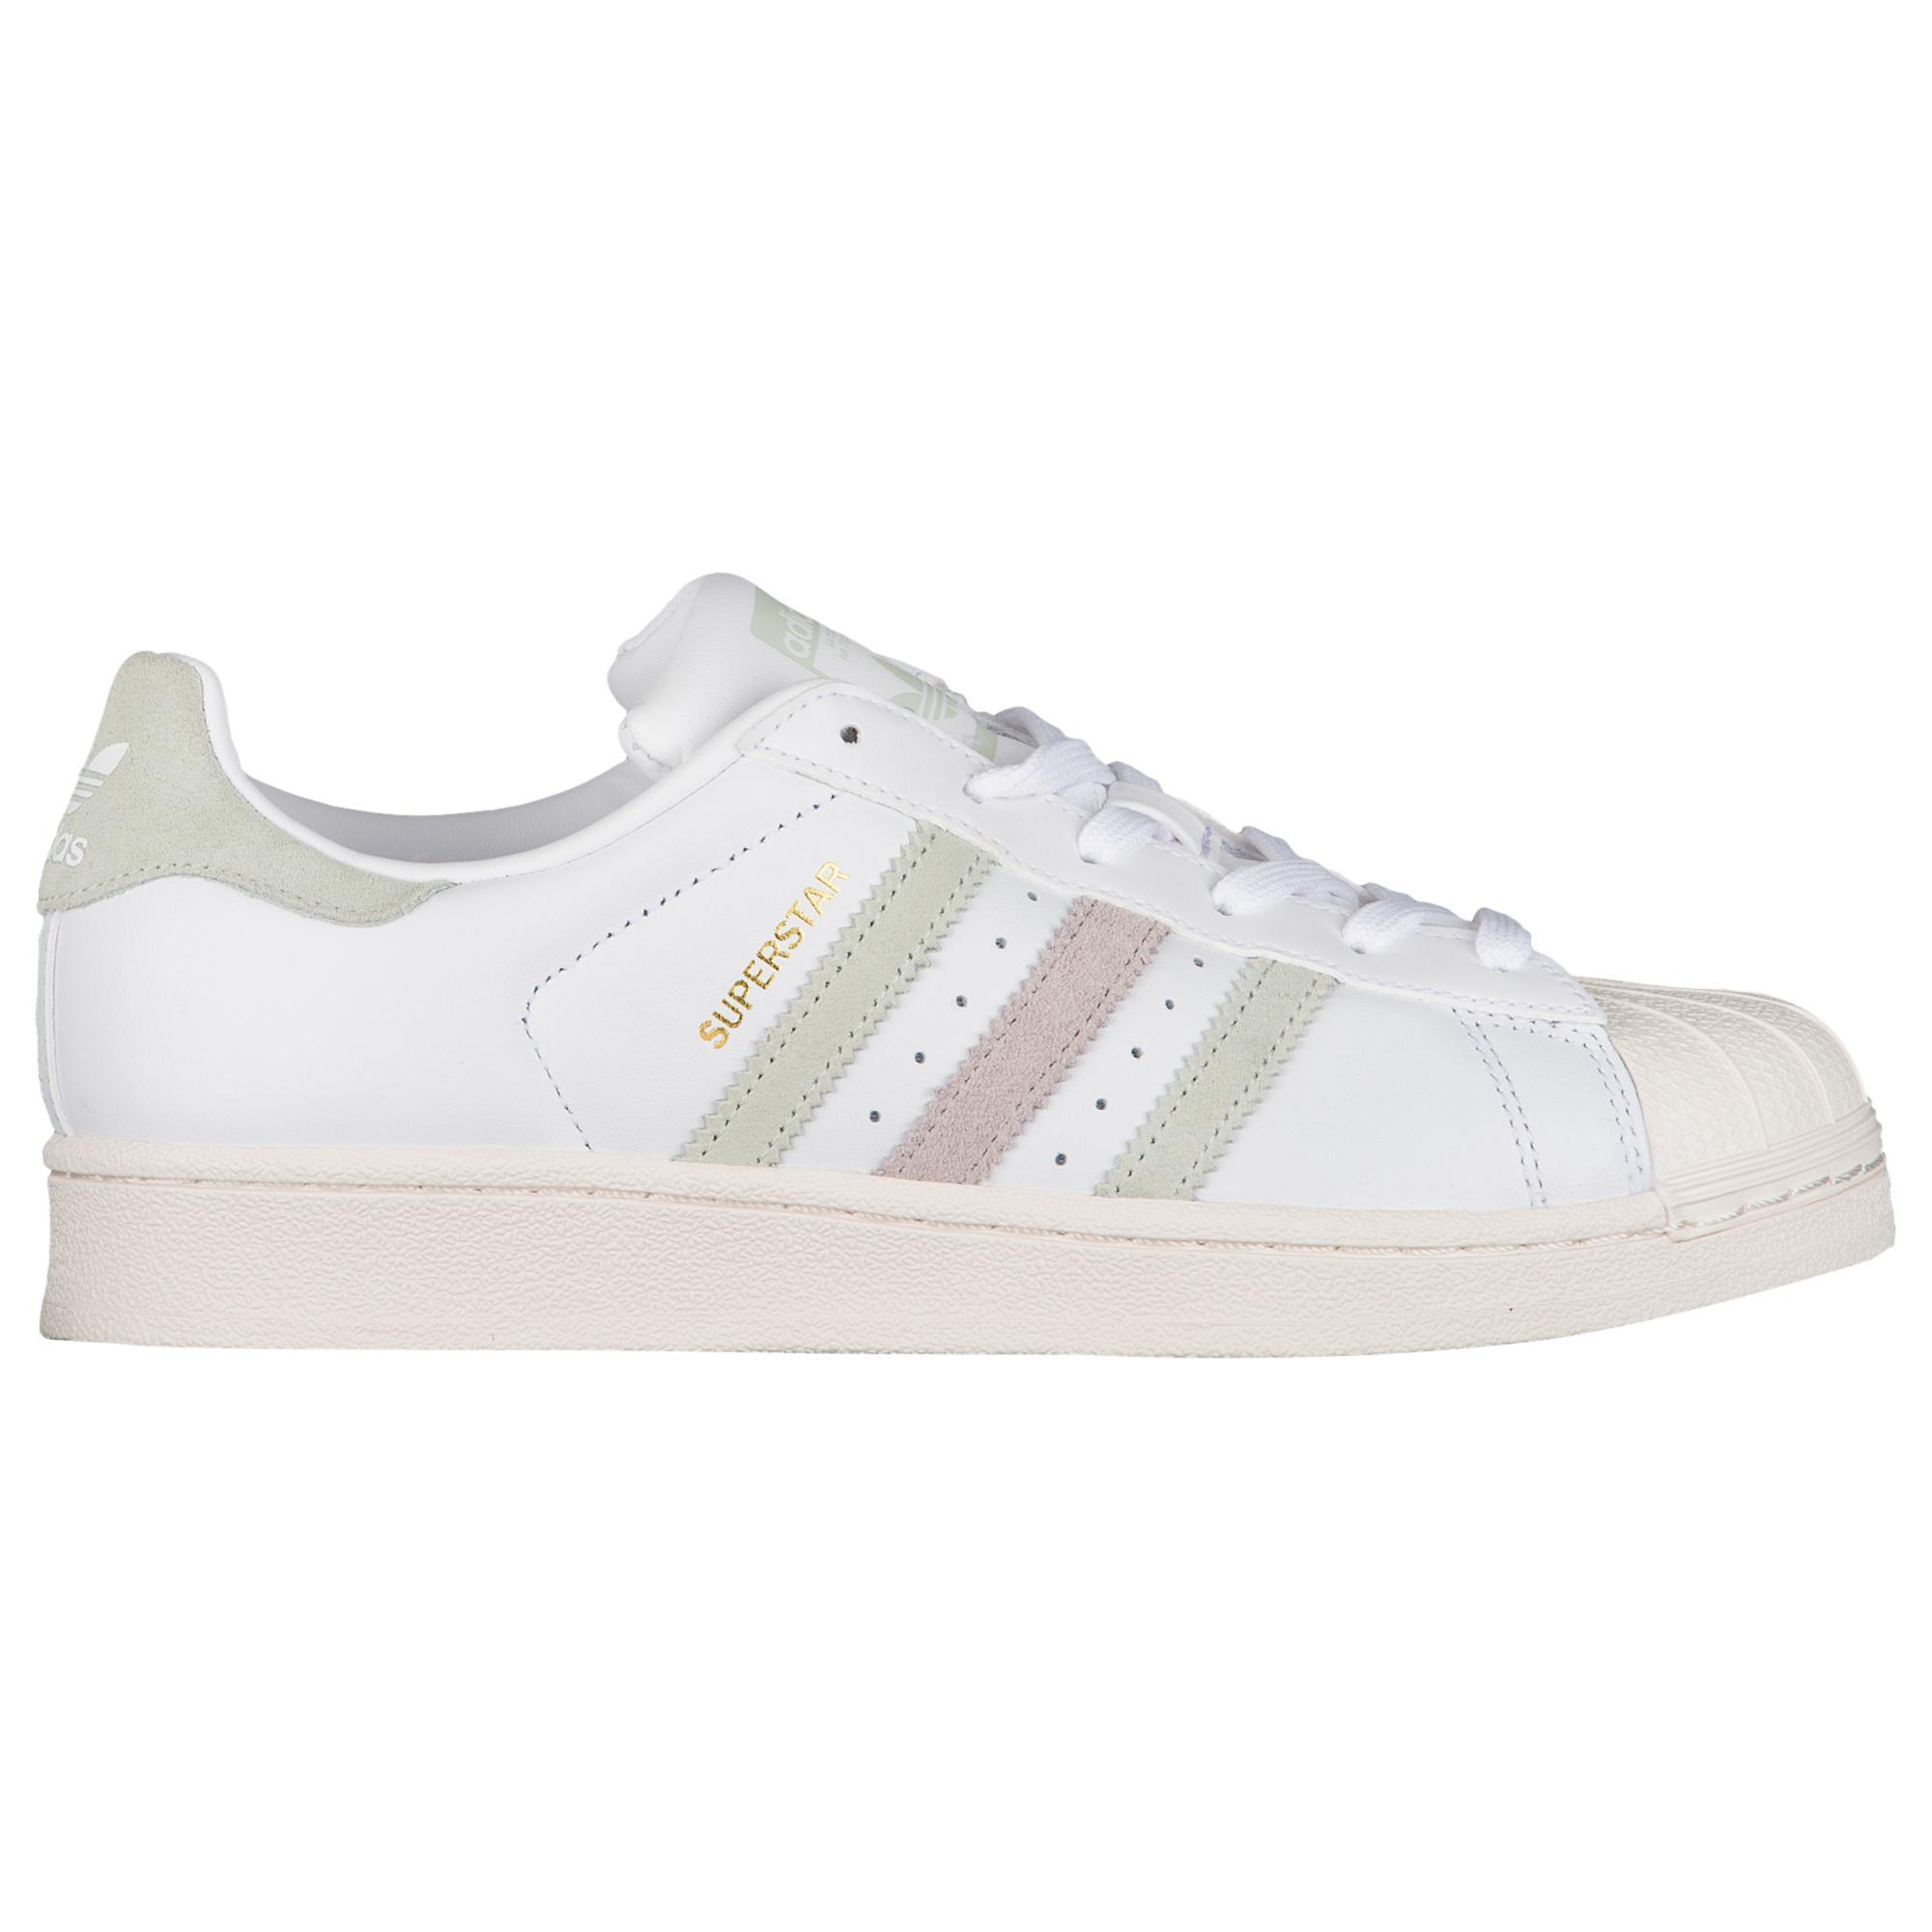 official photos 430b2 2c140 adidas Originals. Women s White Superstar